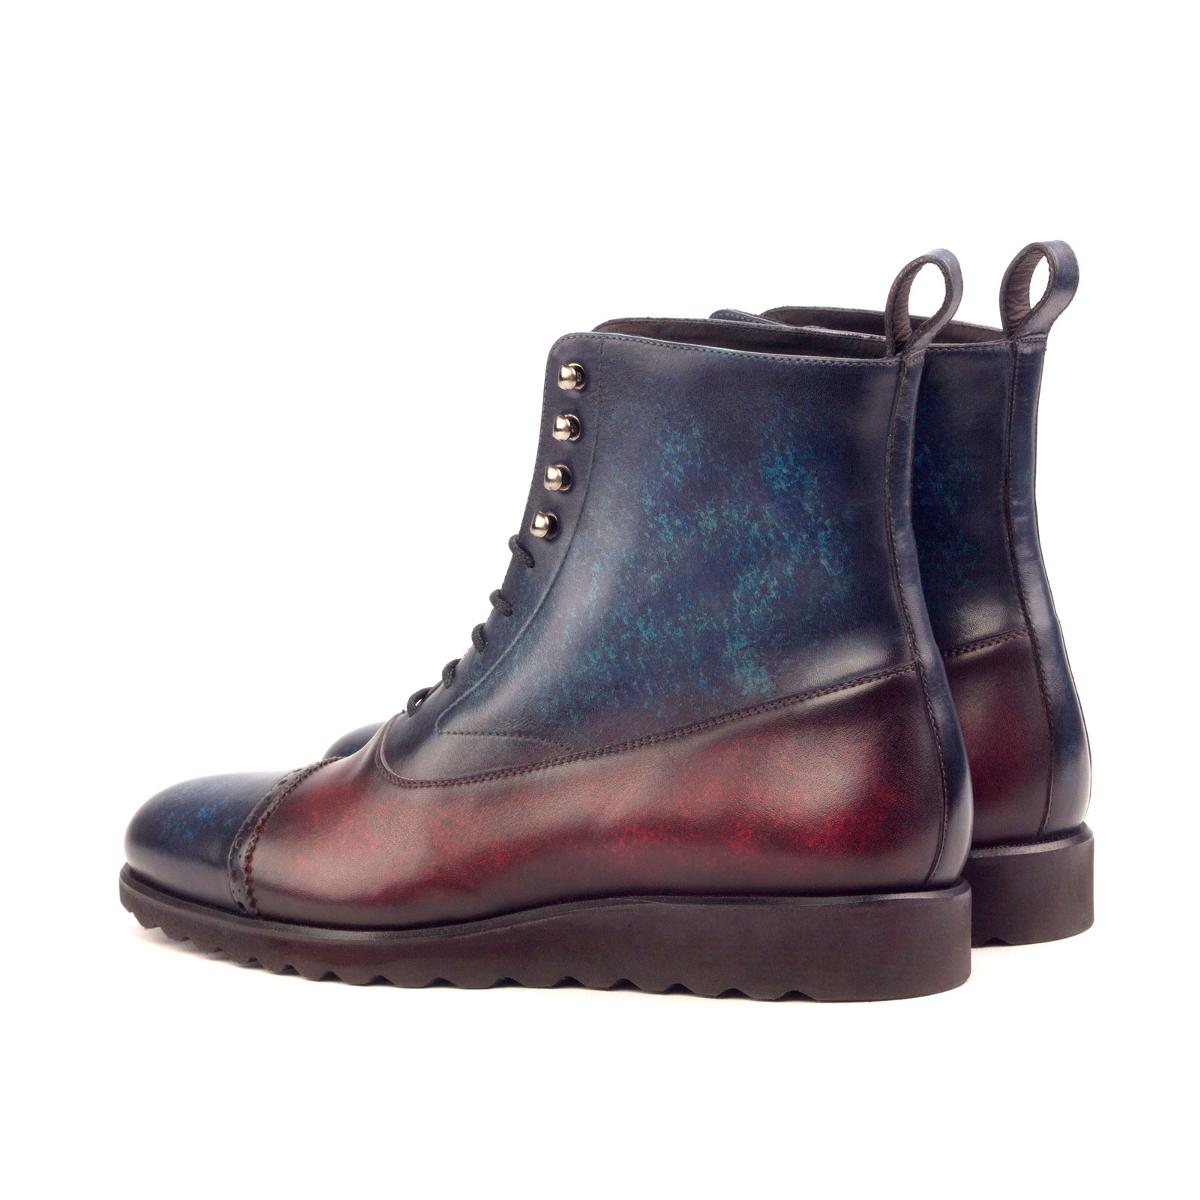 Crust patina denim and burgundy Balmoral boot